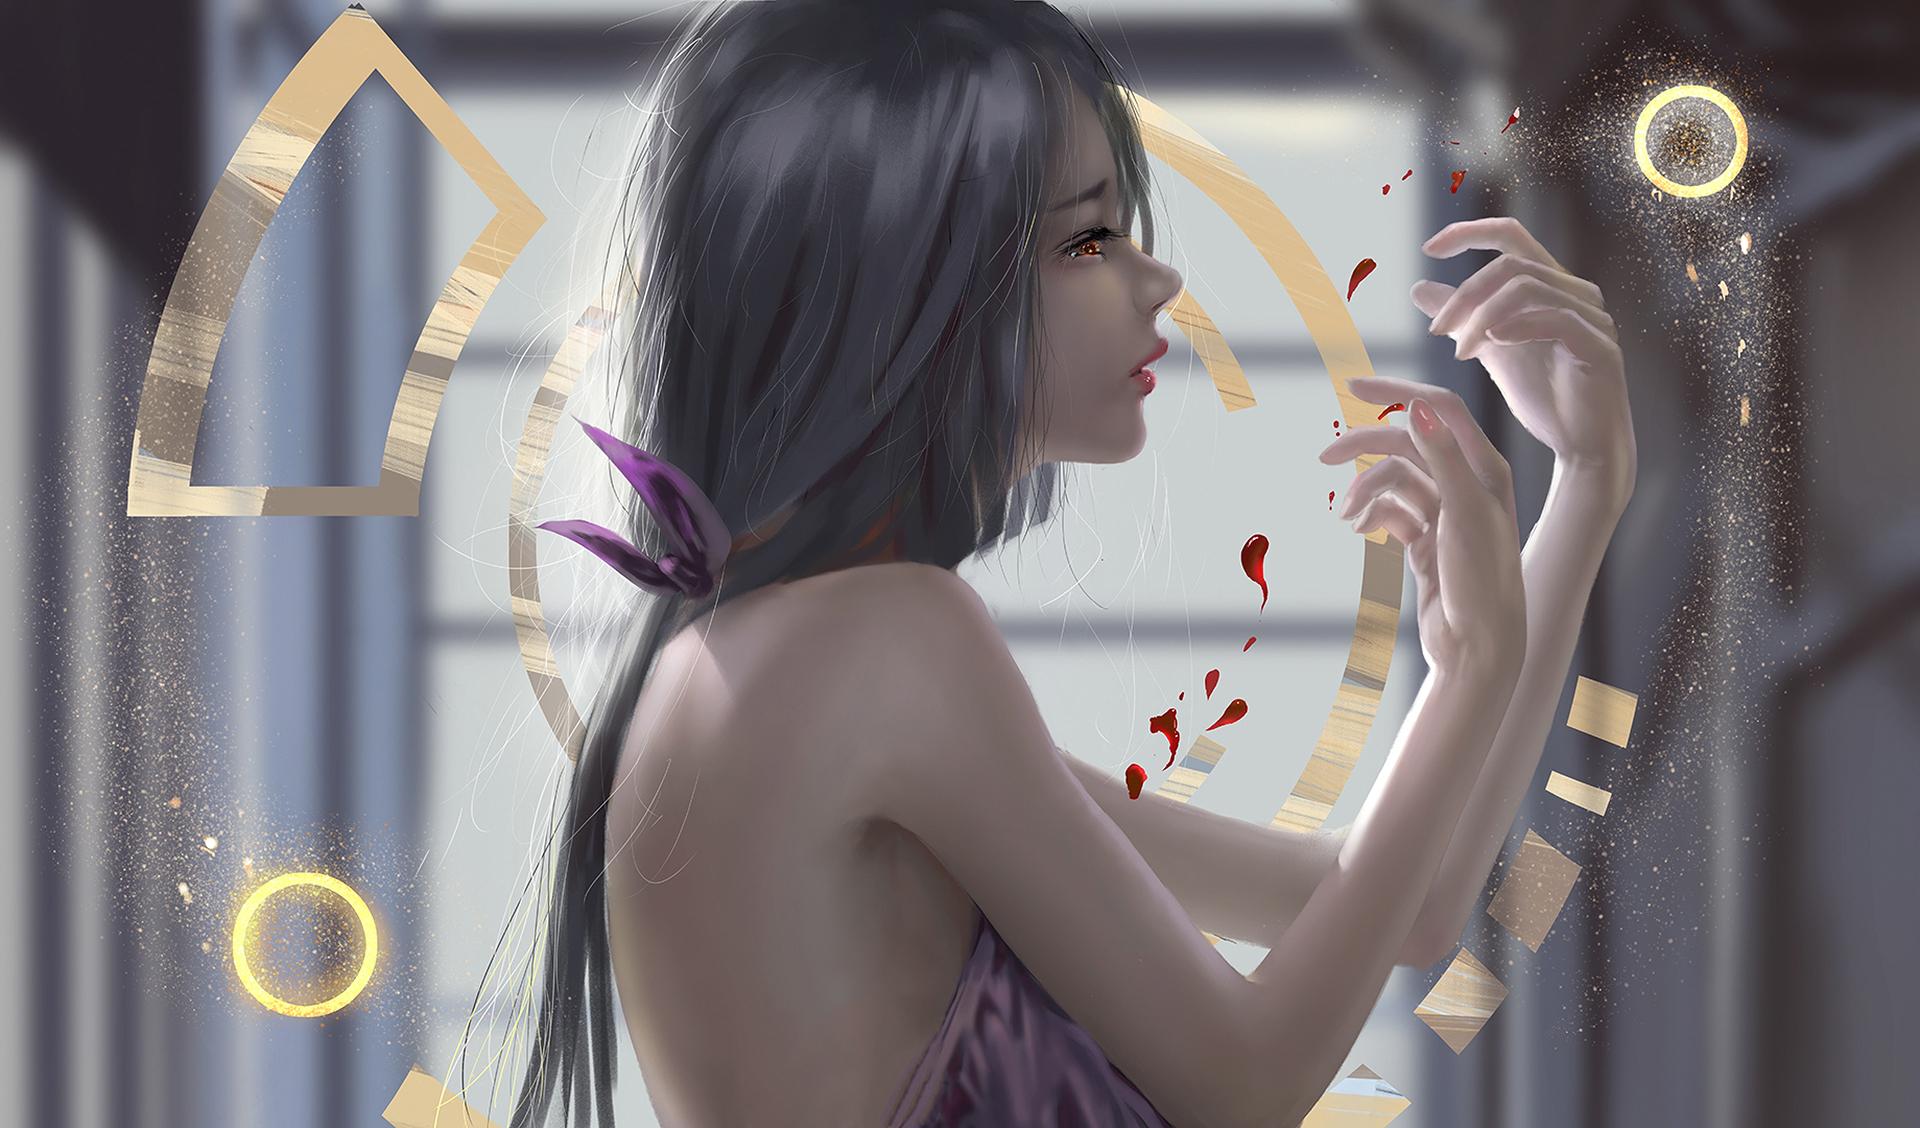 2048x2048 Anthem Ipad Air Hd 4k Wallpapers Images: 2048x2048 Anime Girl Elves Fantasy Art Art Ipad Air HD 4k